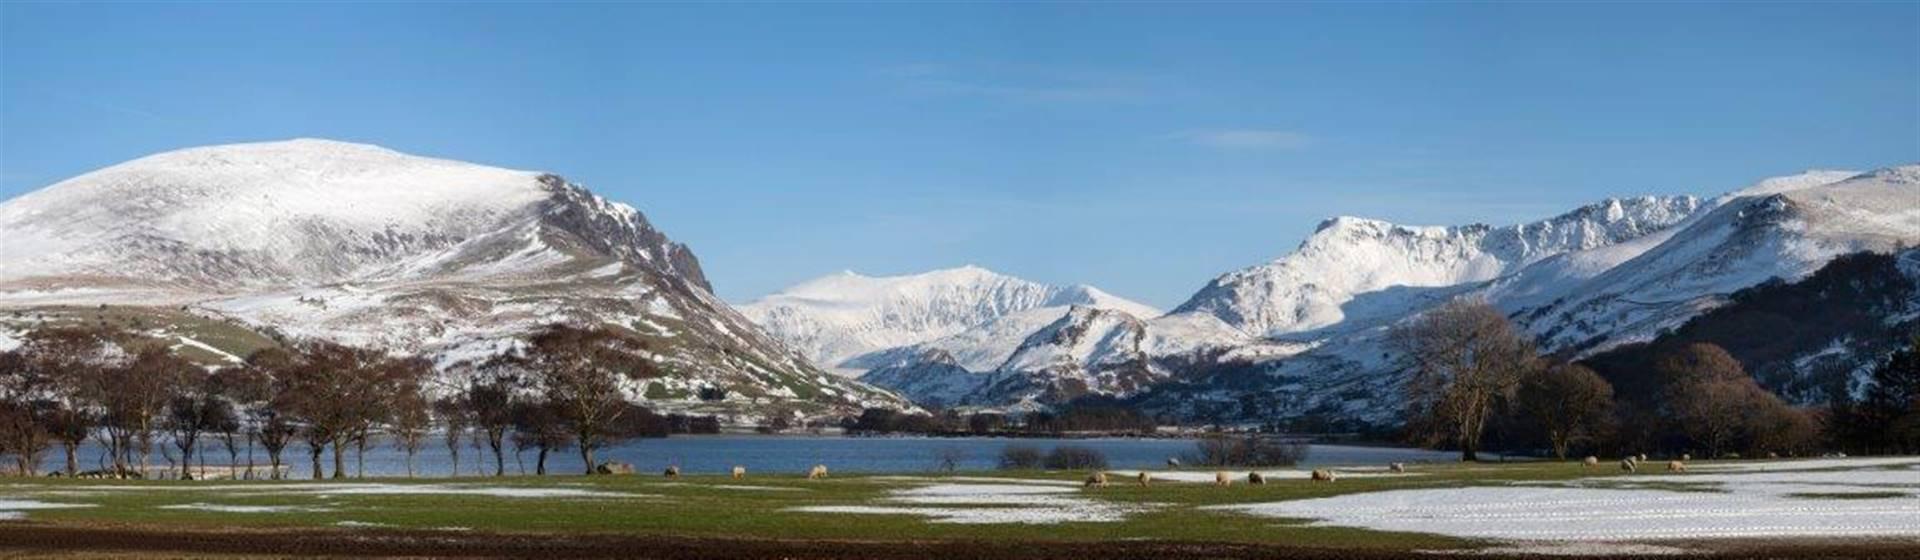 "<img src=""snowdonianationalparklandscape-adobestock.jpeg"" alt=""Snowdonia National Park""/>"